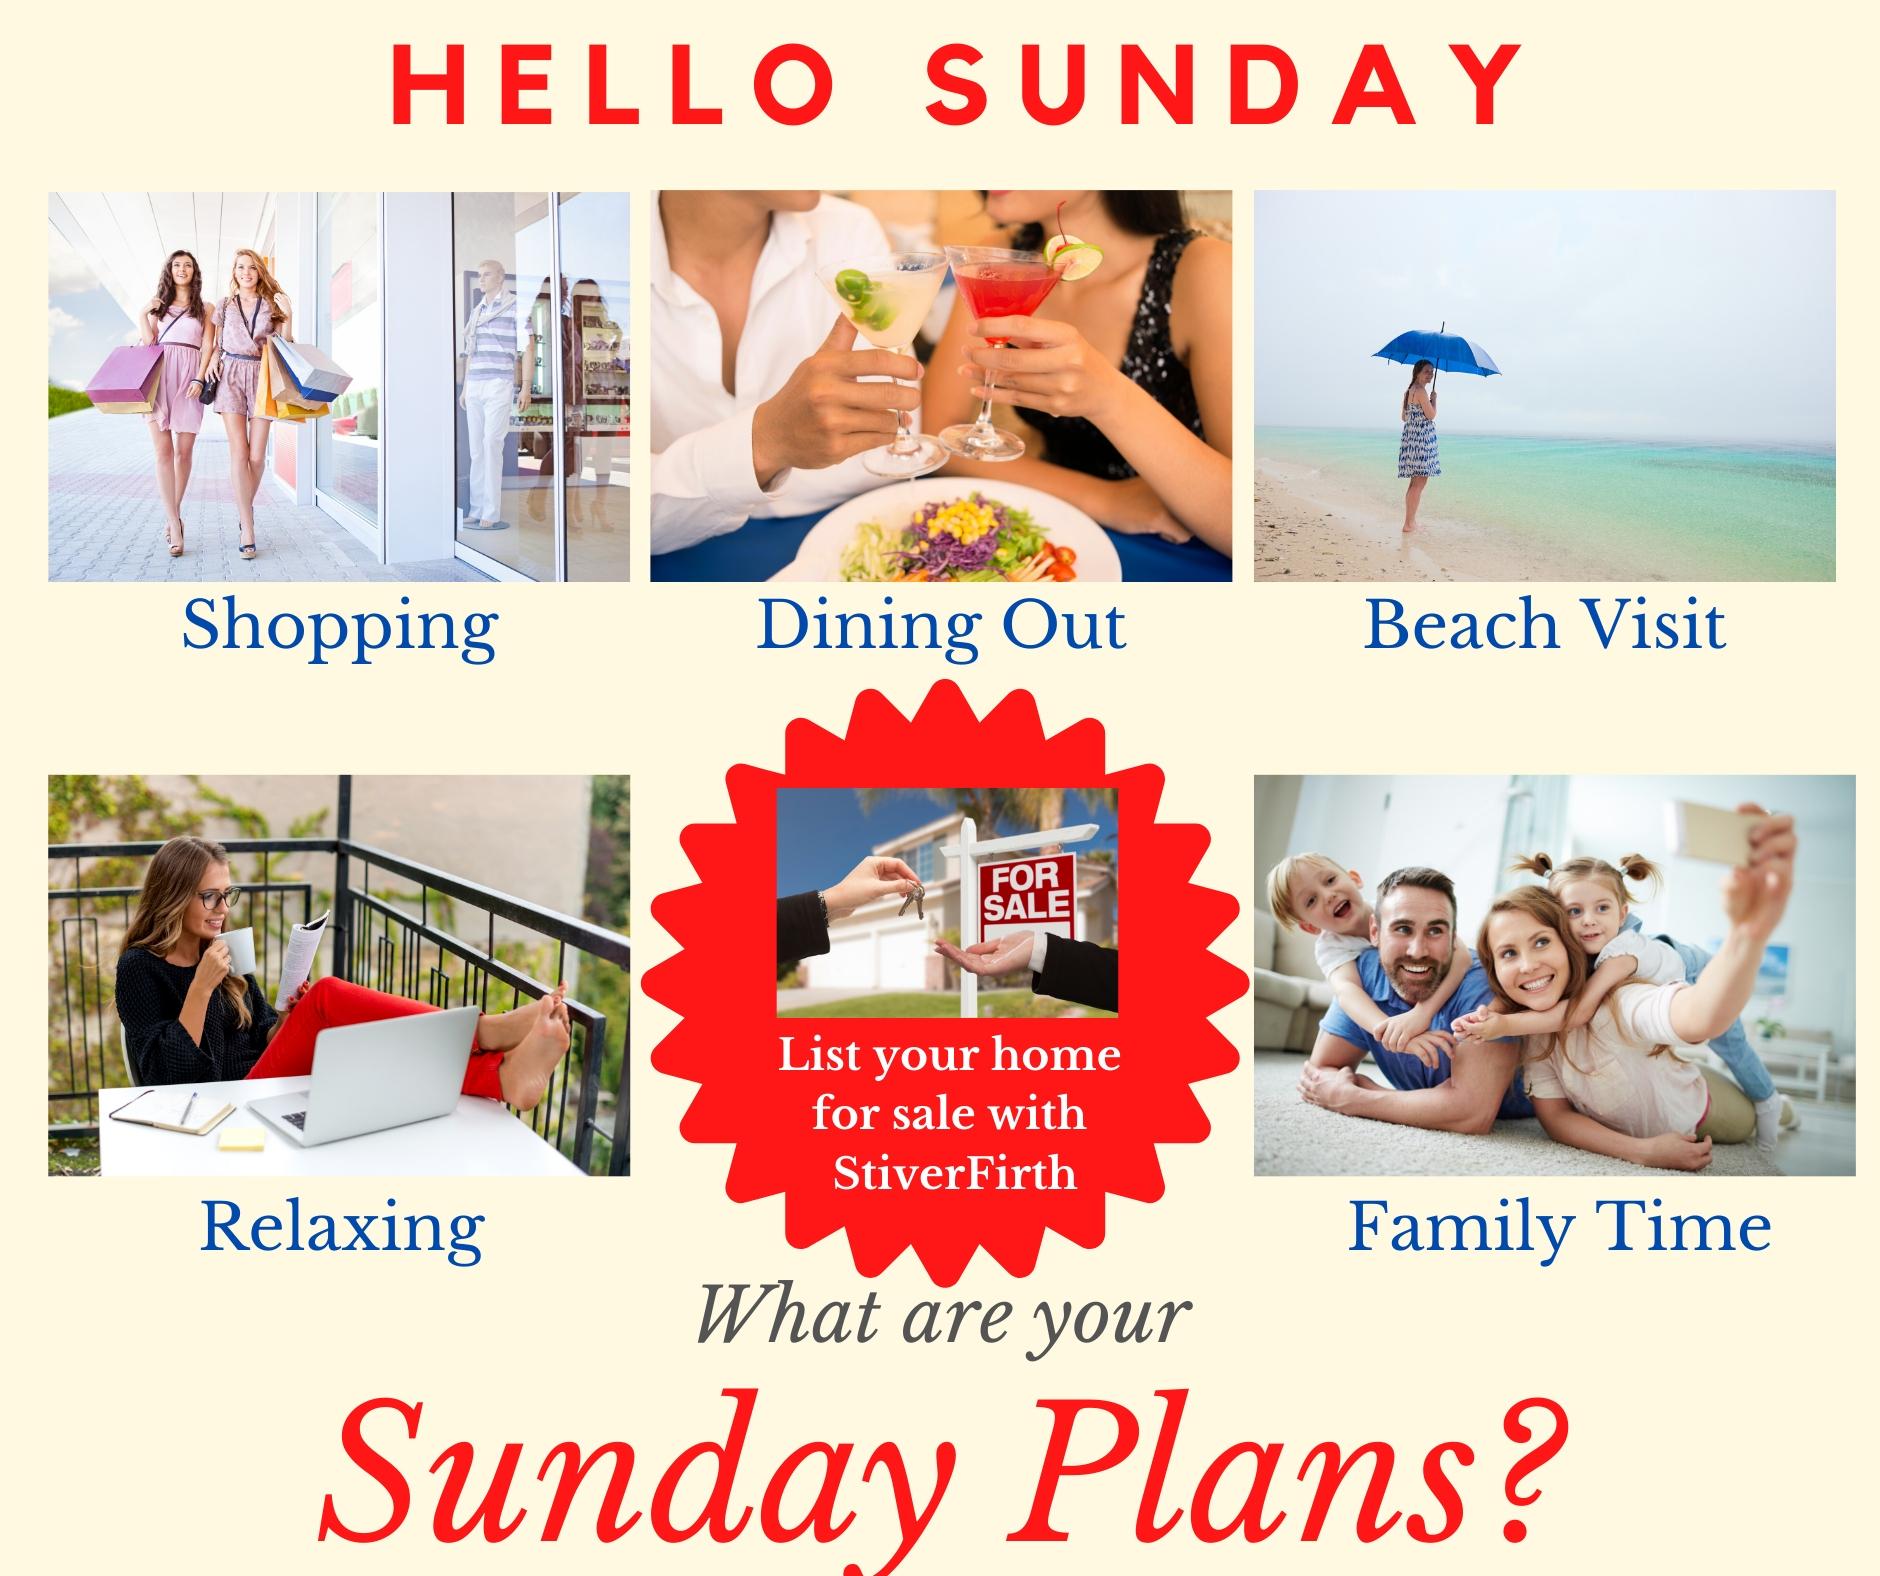 sunday_plans.jpg